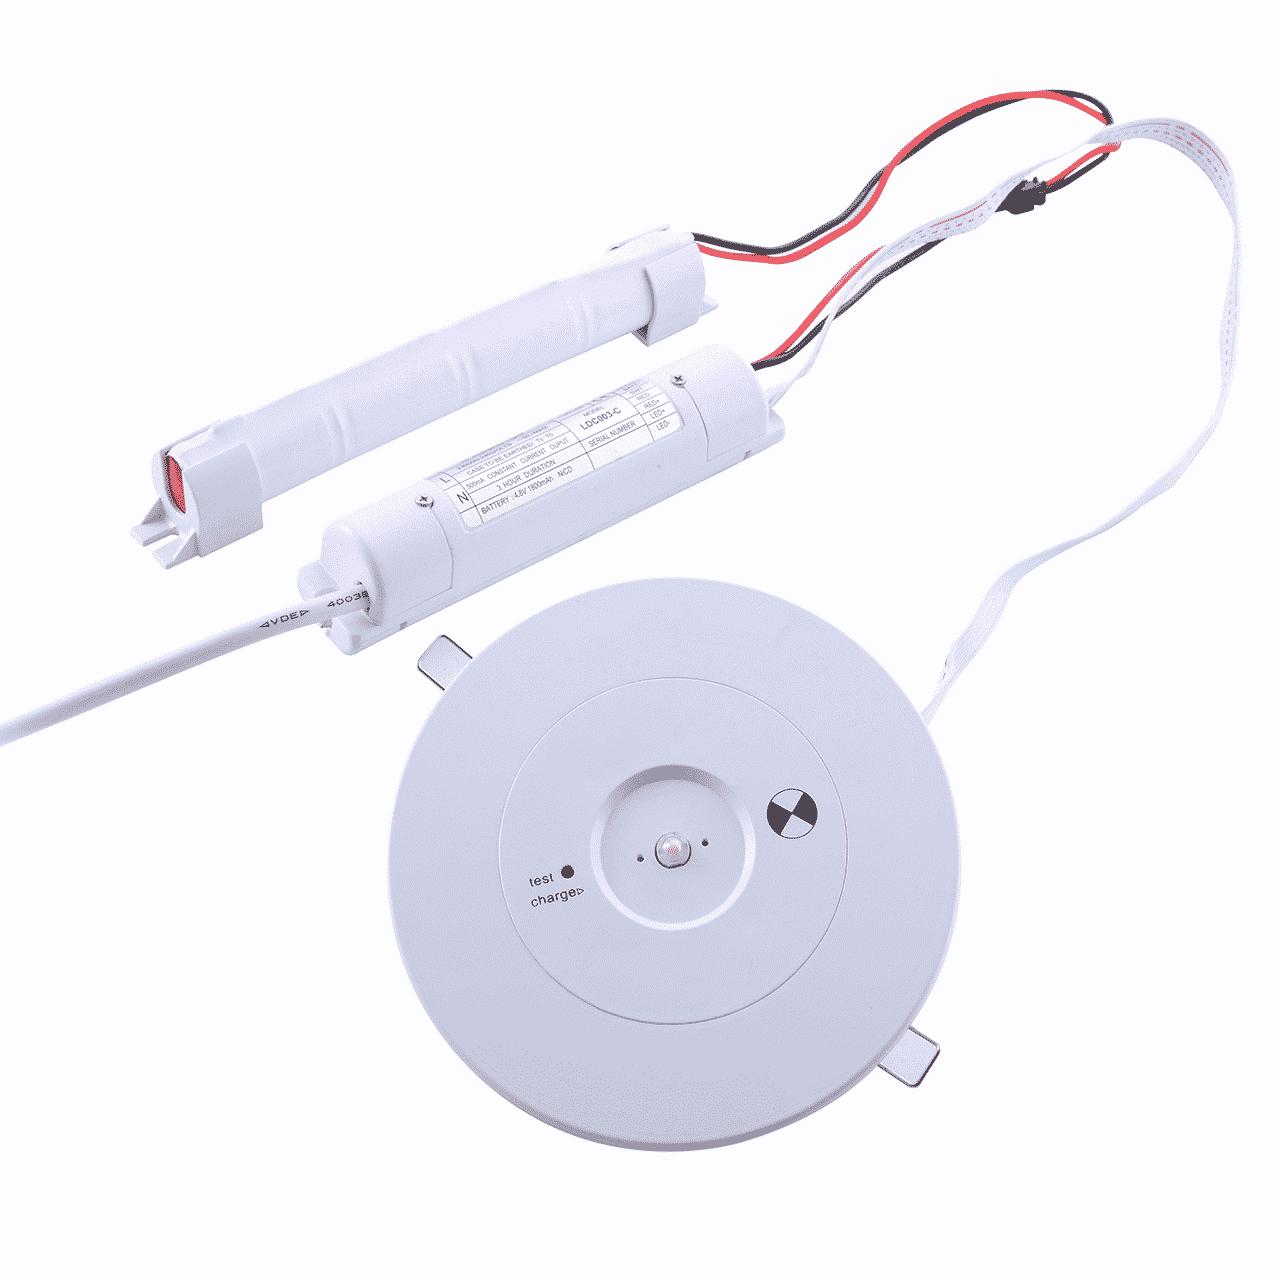 noodverlichting spot- 3 watt - inbouw - wit - rond - 6000K